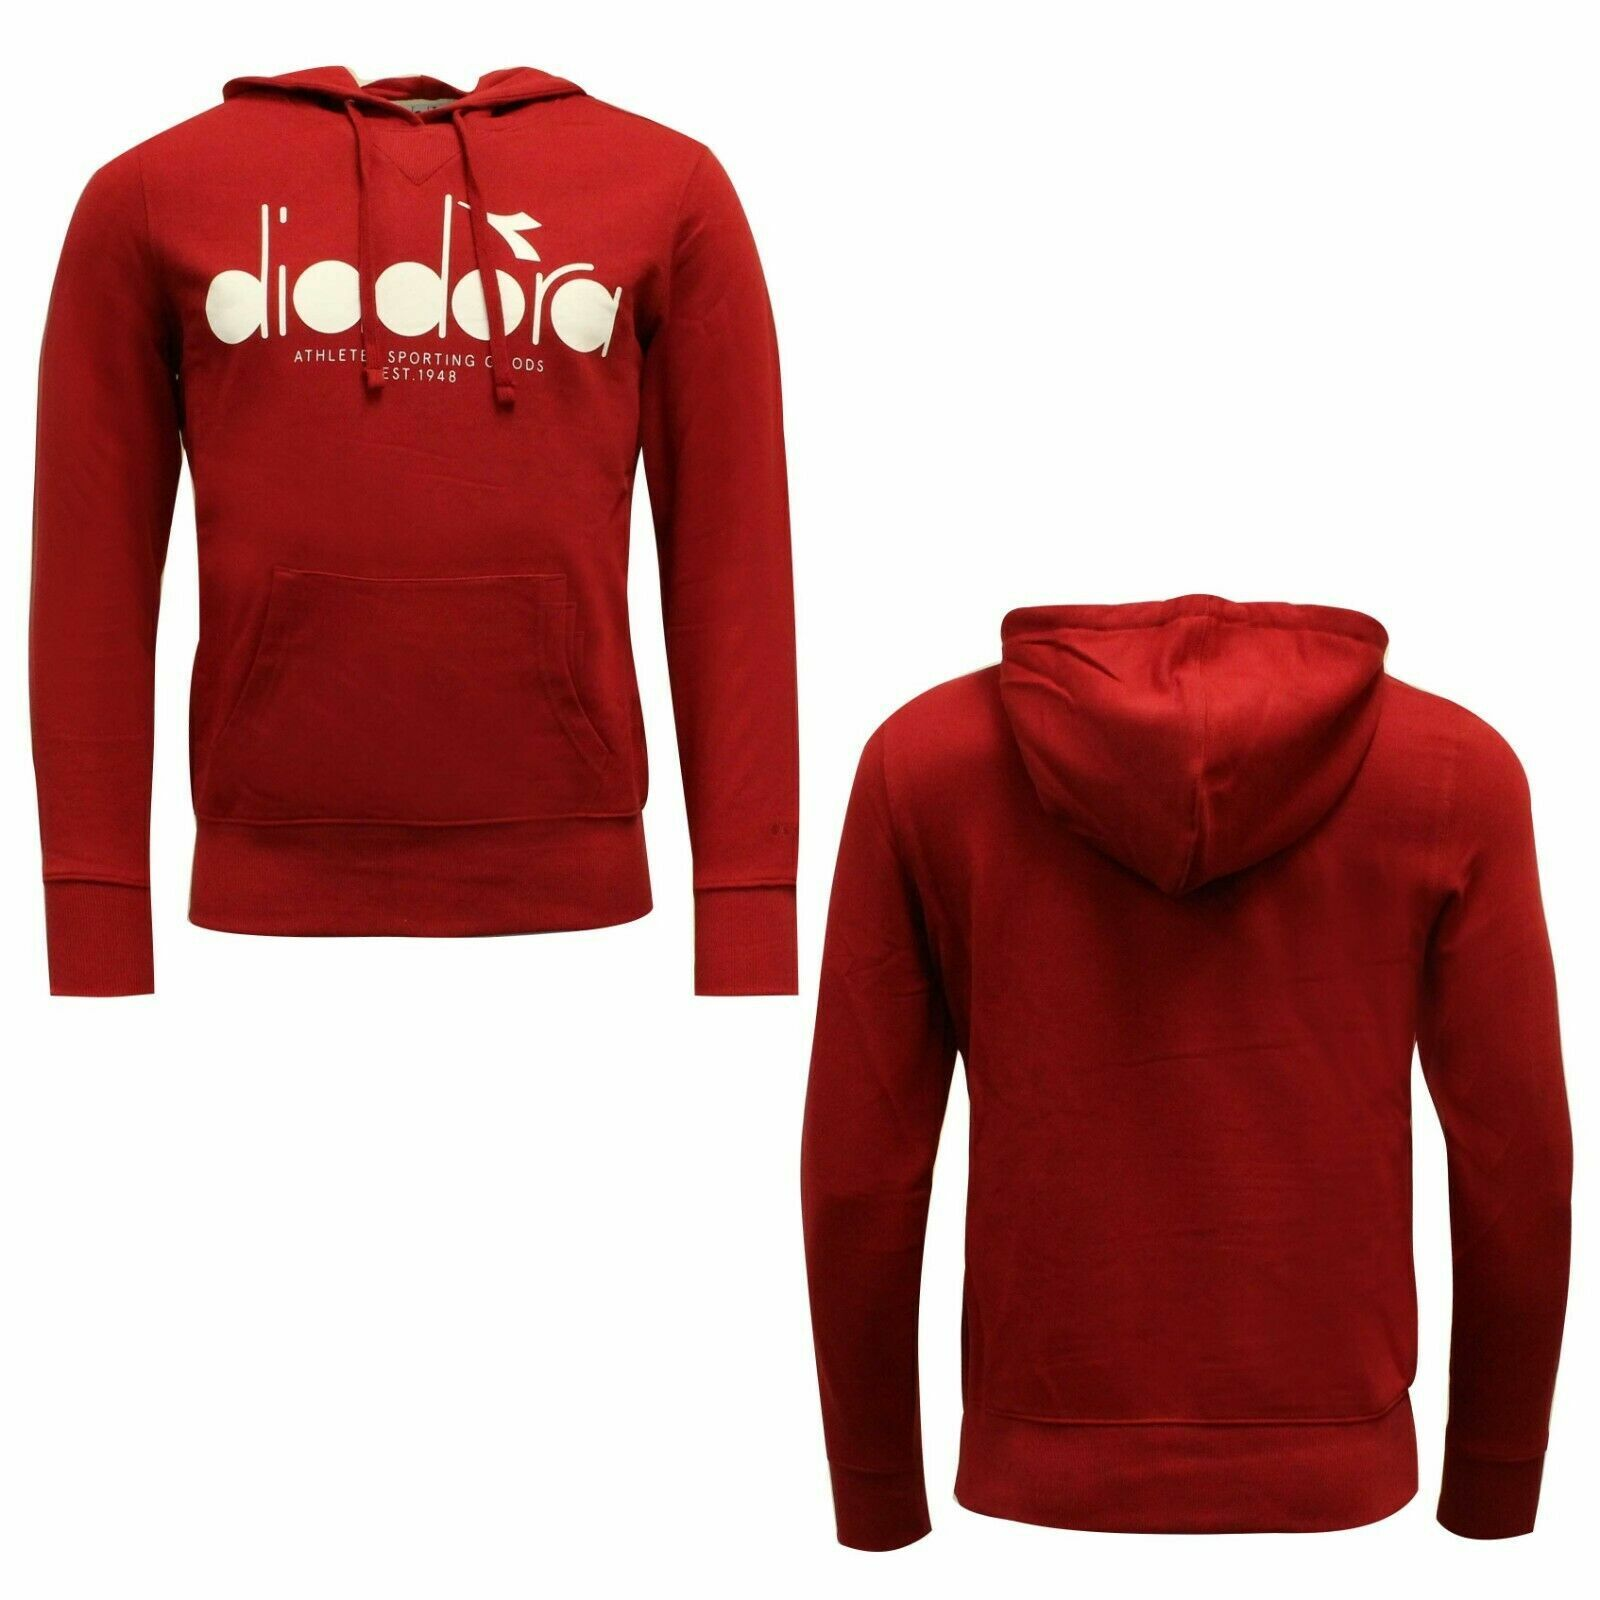 Diadora Sportswear Mens Hoodie Sweatshirt Jumper Red 502 173623 45080 A49B